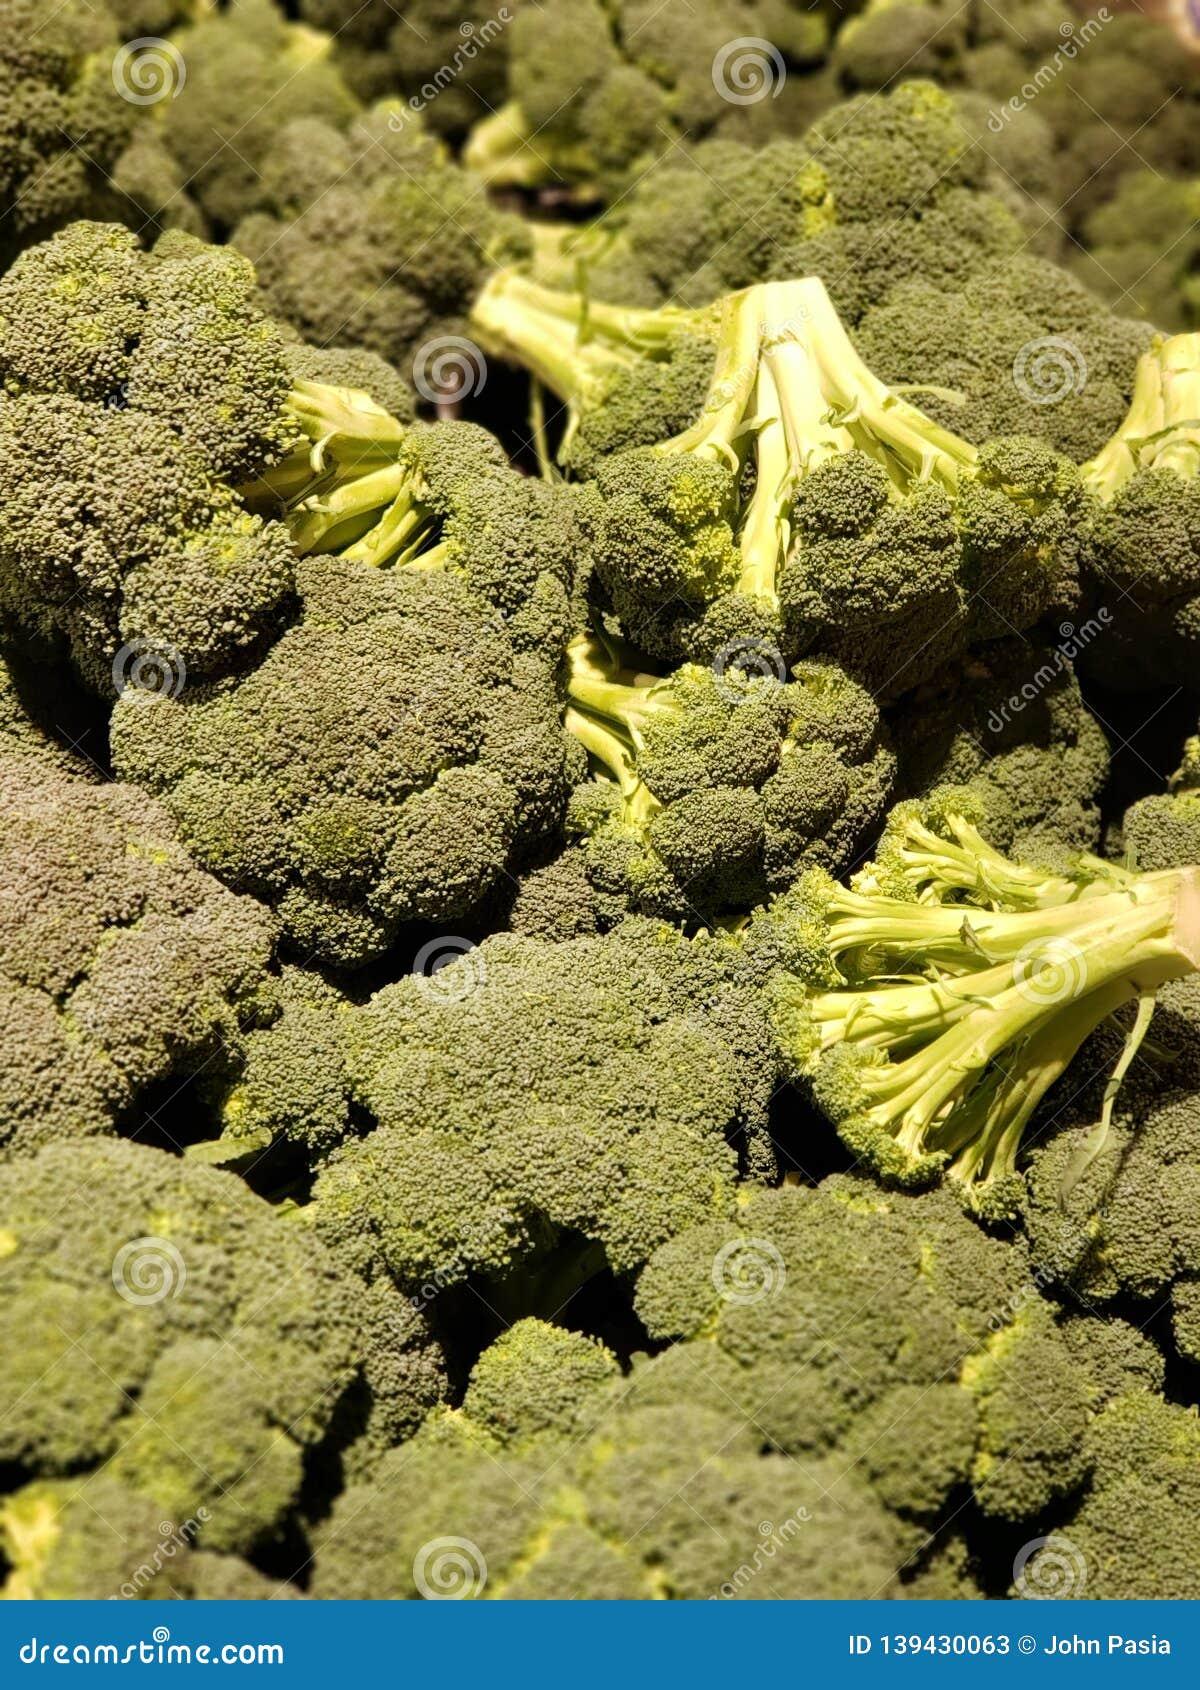 Groupe de têtes de brocoli